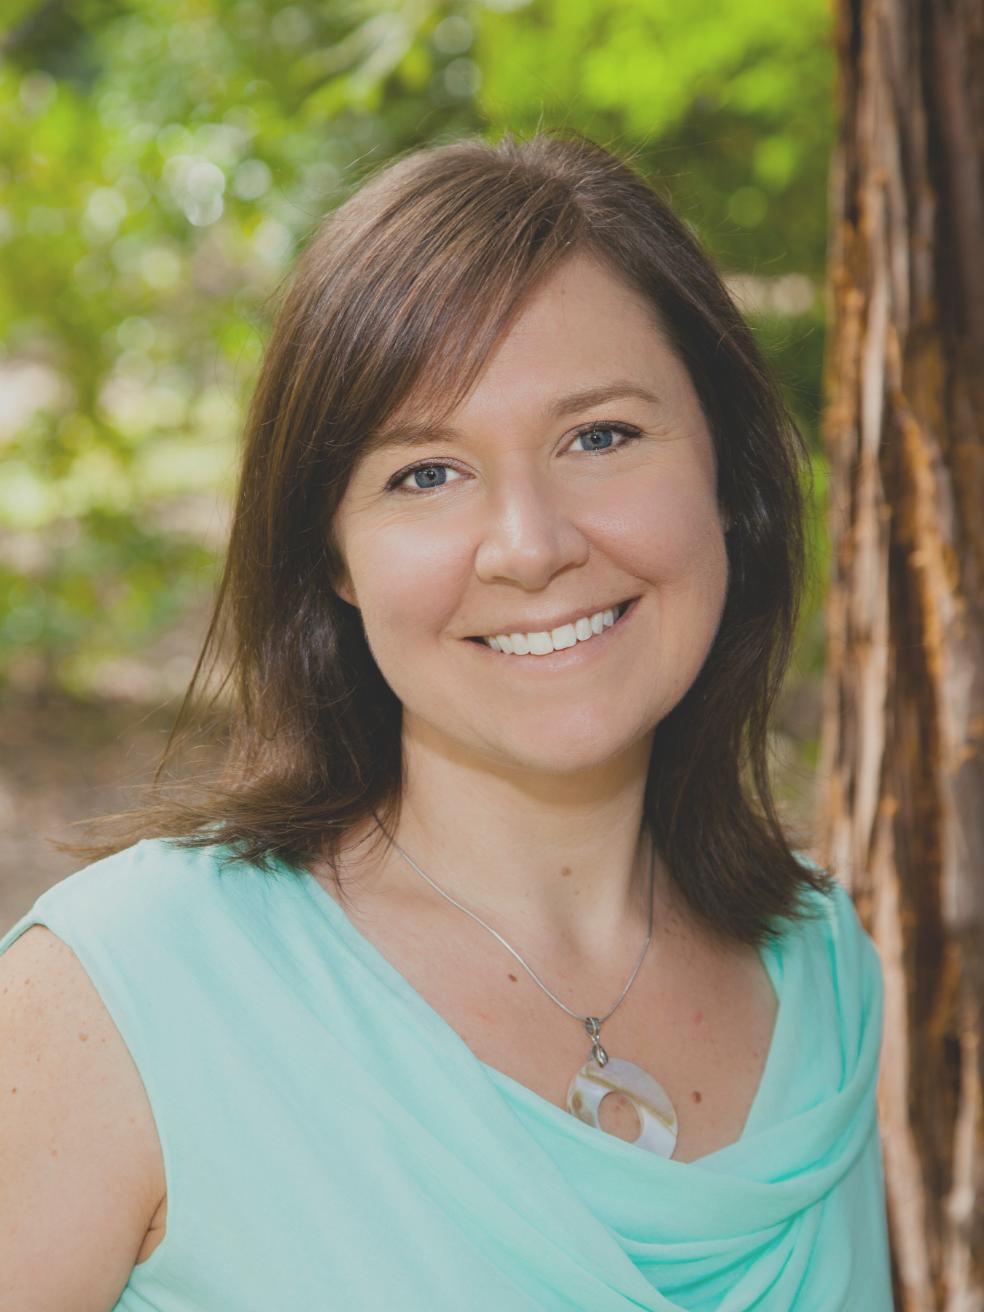 Adriana Joyner, Therapist